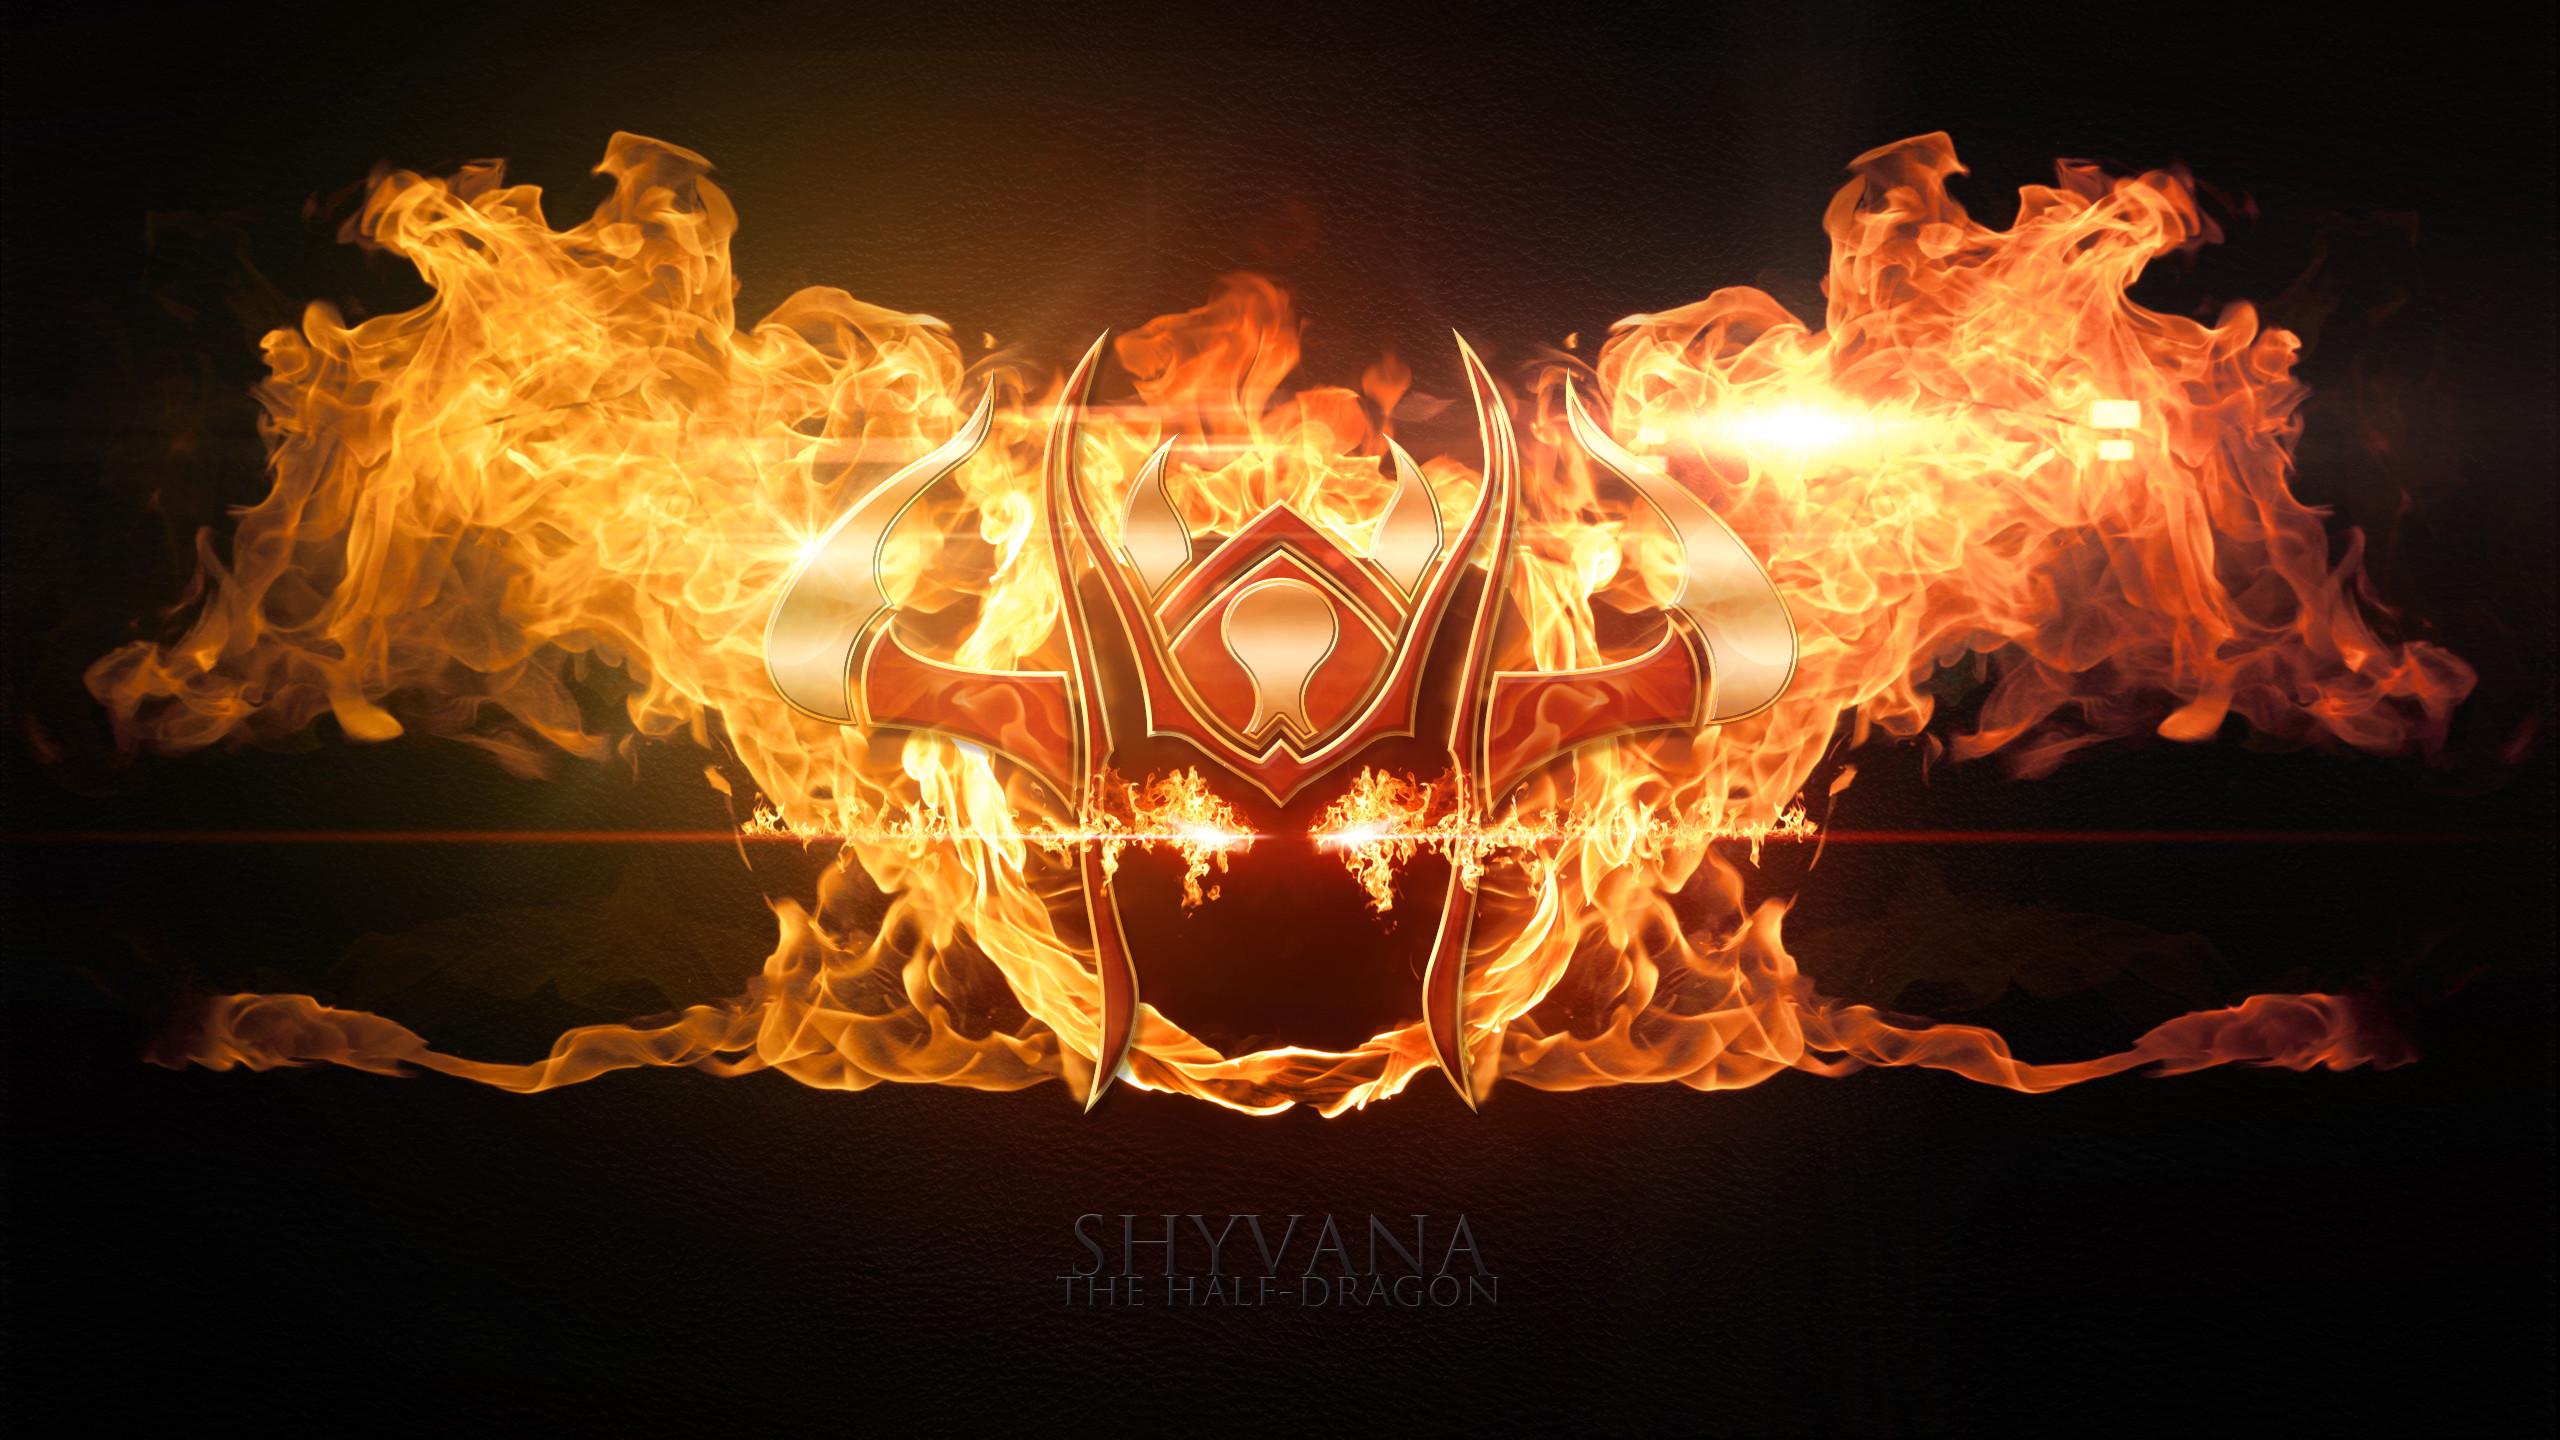 Shyvana League Of Legends Wallpapers HD 1920×1080